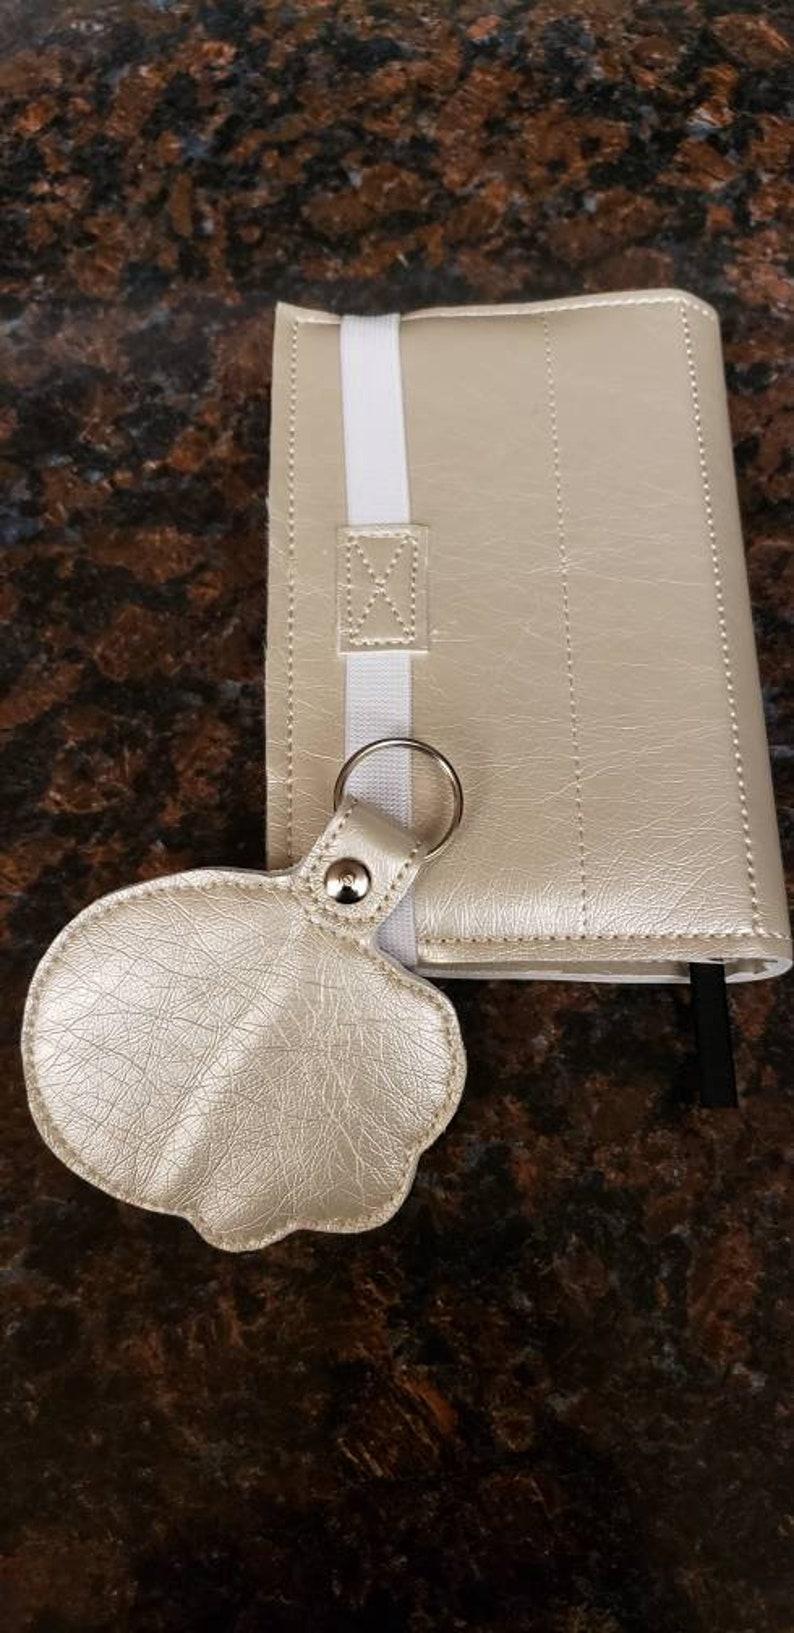 Snap Men Leather Wallet Zipper Buckle Eagle Thread Coins Pocket Card Holder